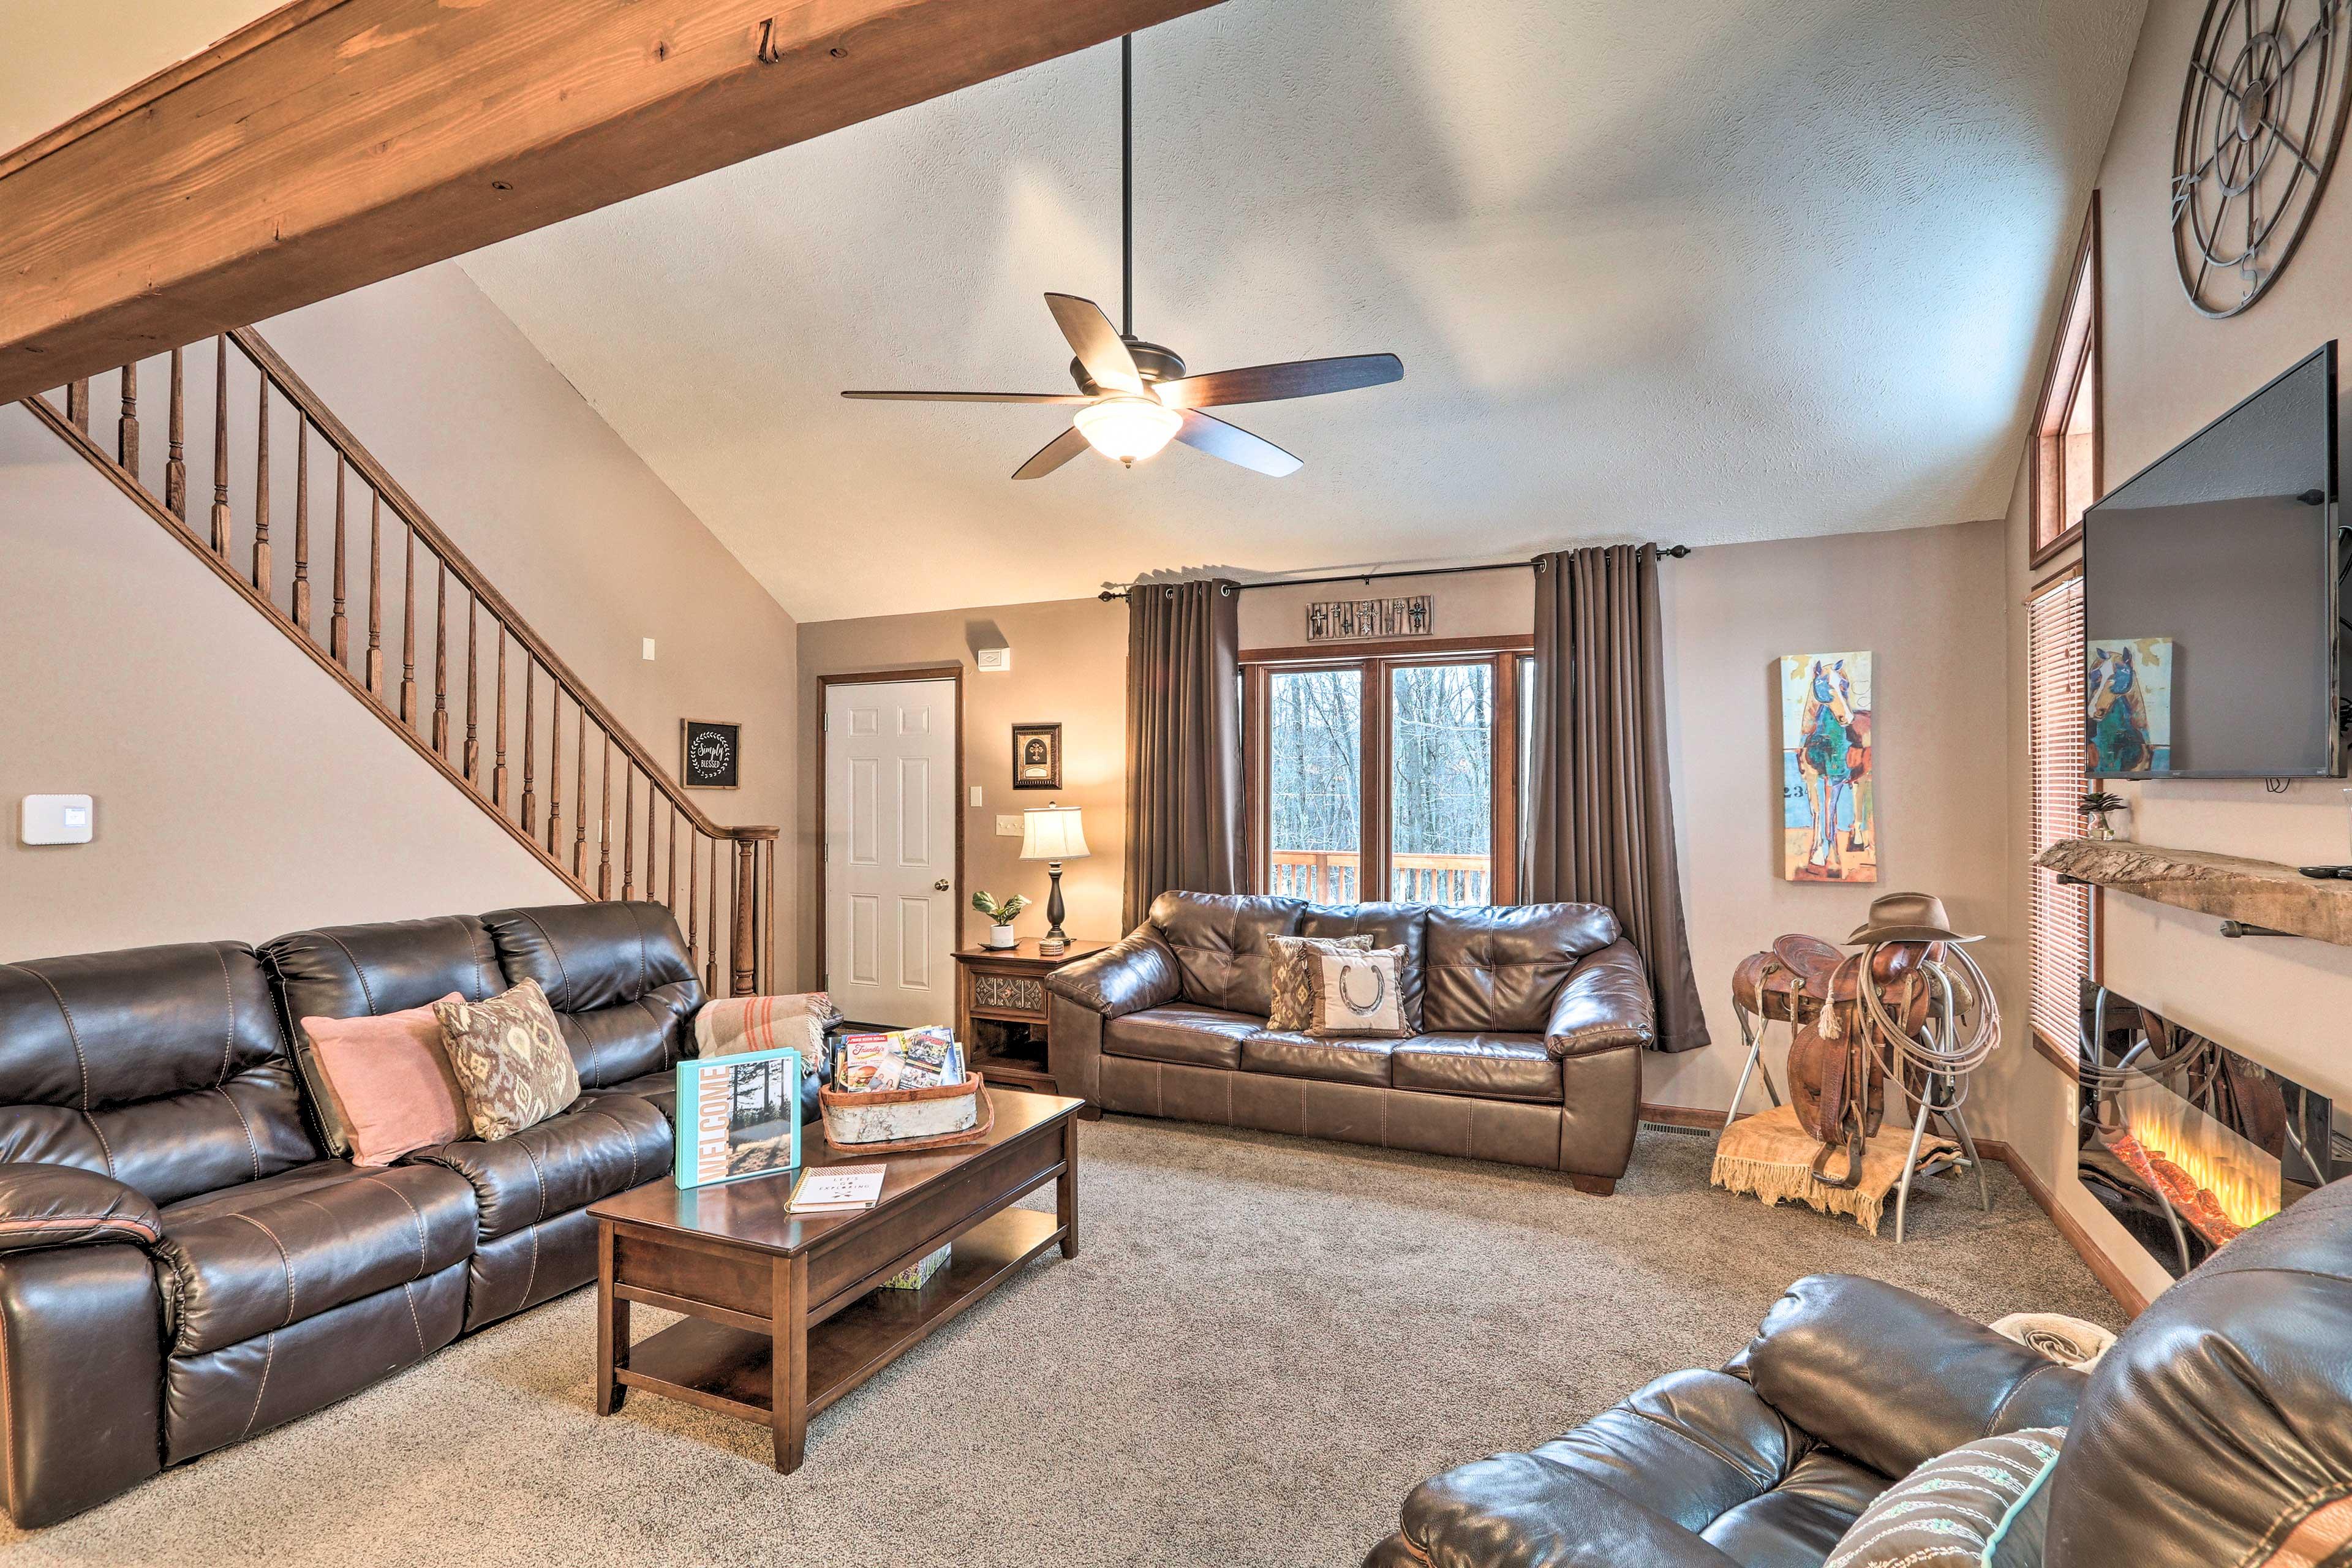 Living Room   Vaulted Ceiling   Exposed Wood Beam